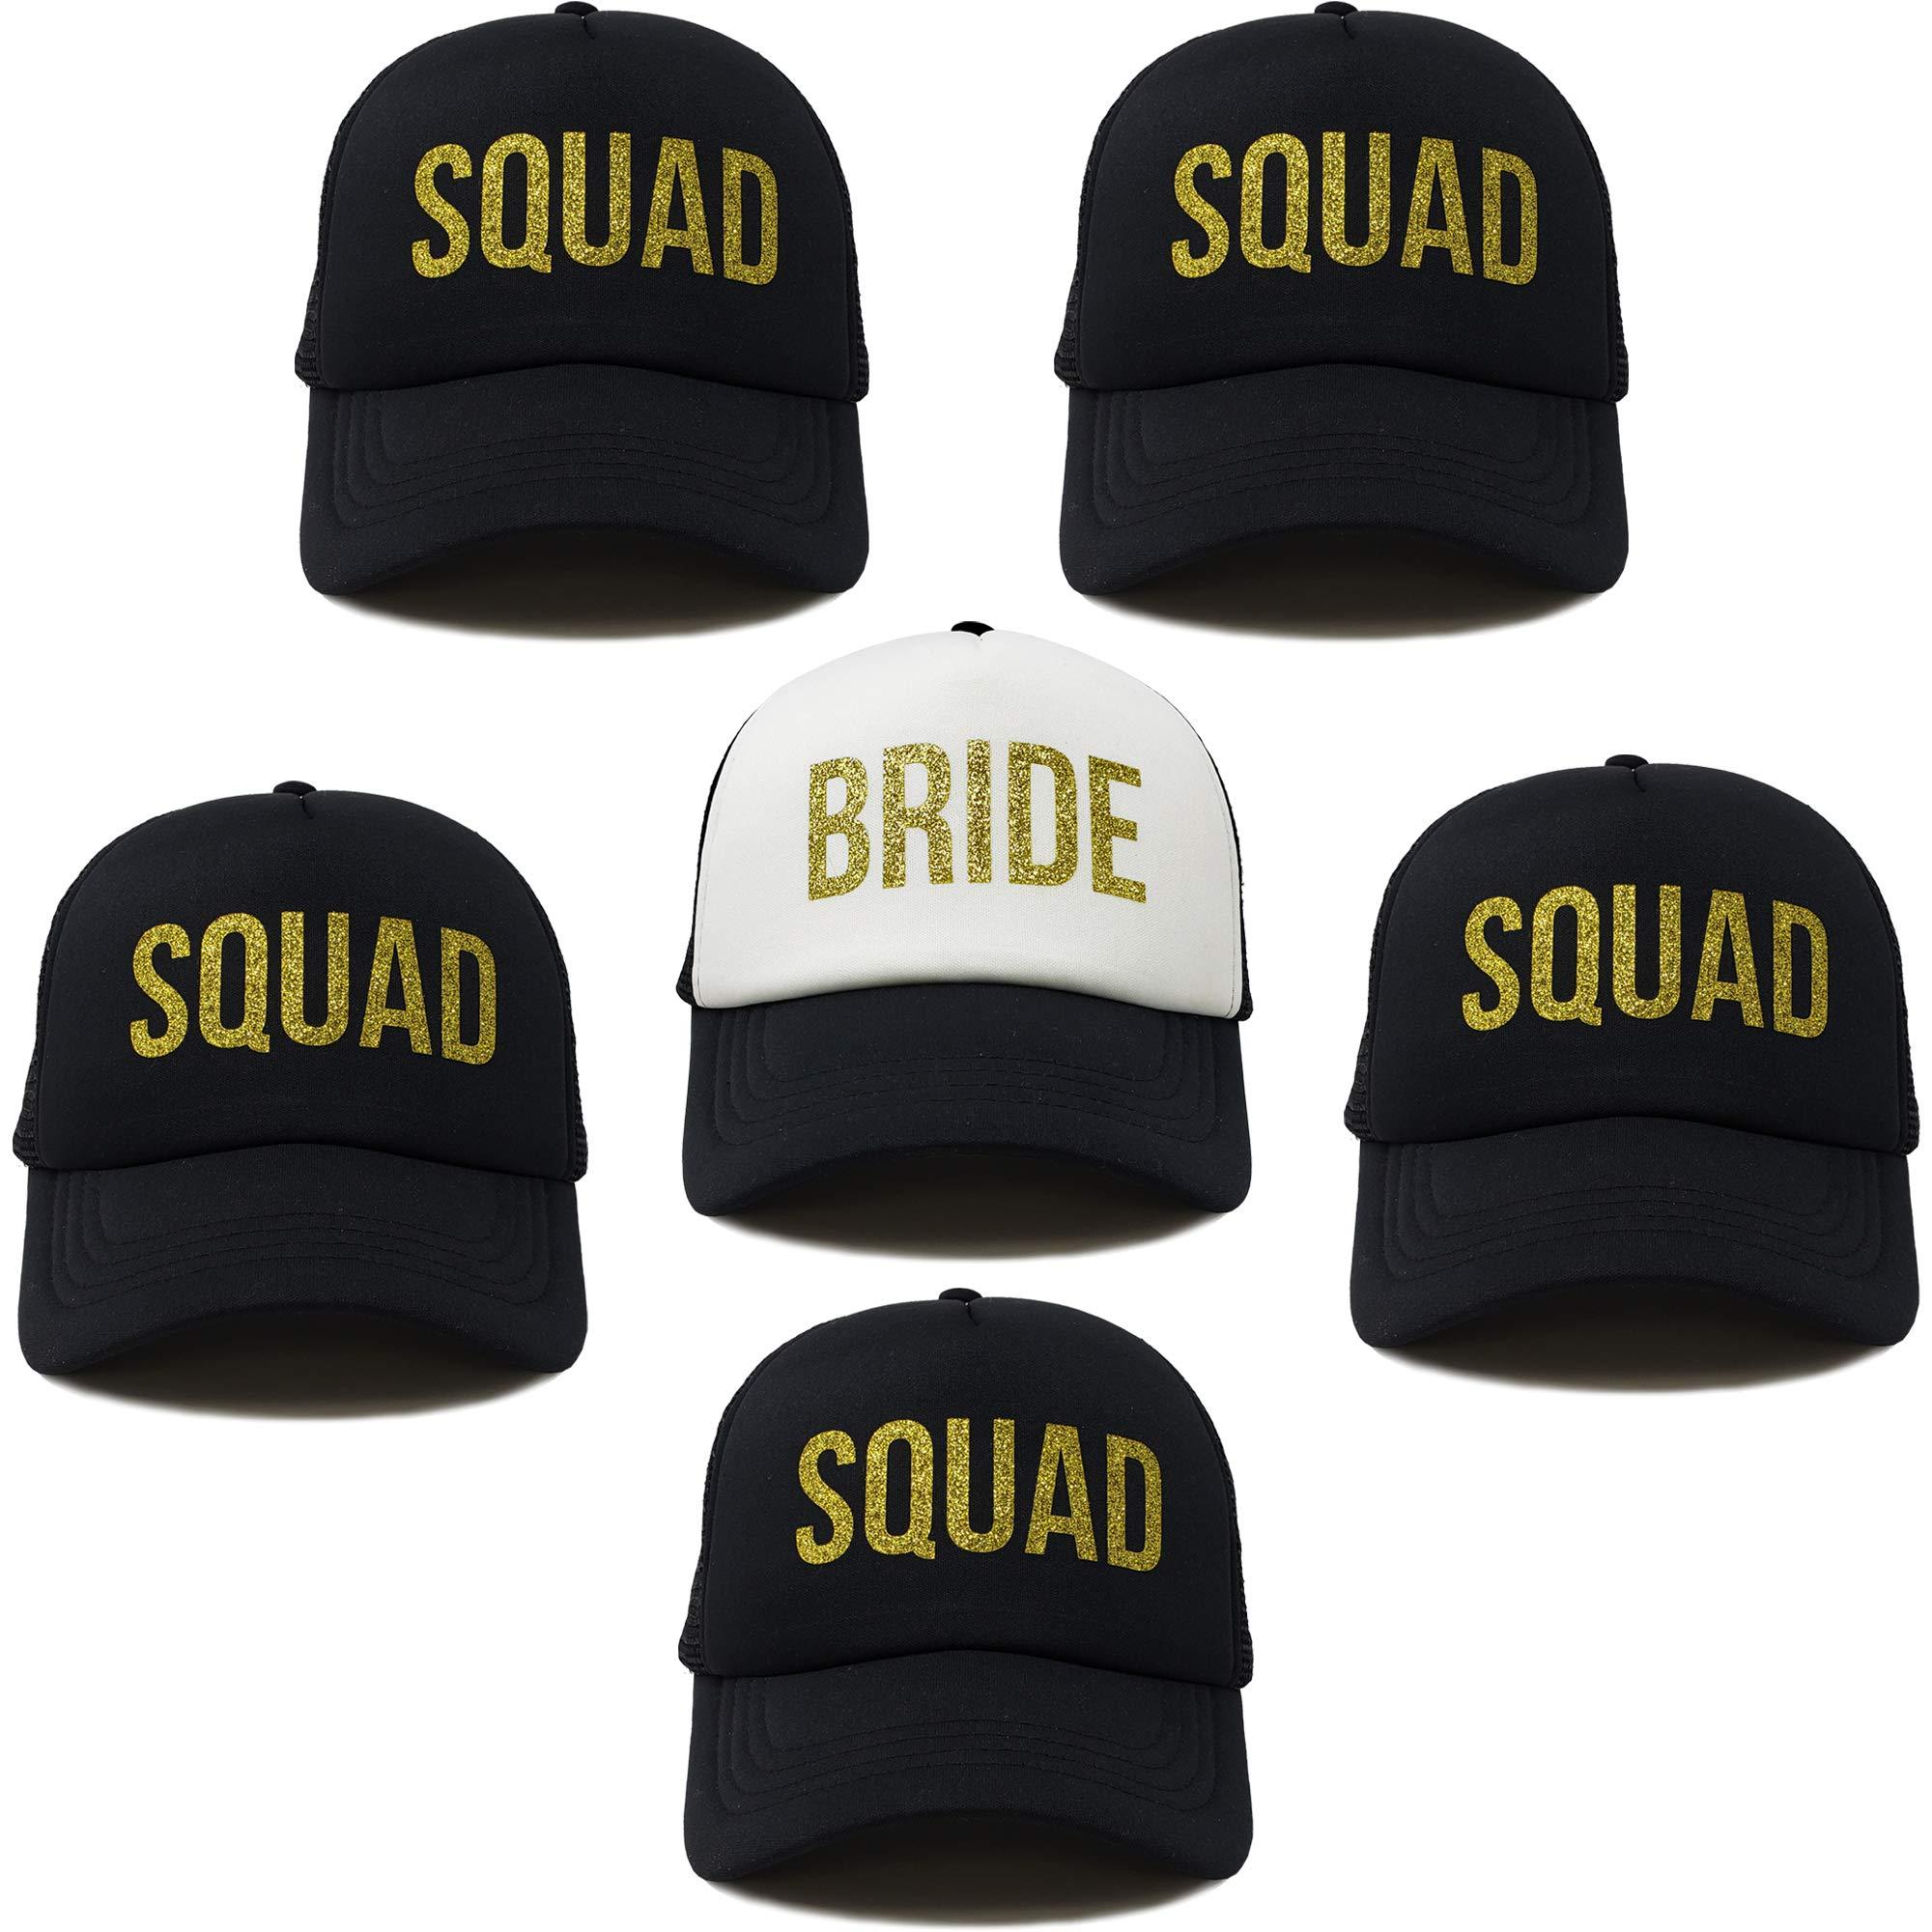 BH-204-6-B0902.5S0602 Bridal Trucker Hat Bundle - 1 Bride, 5 Squads